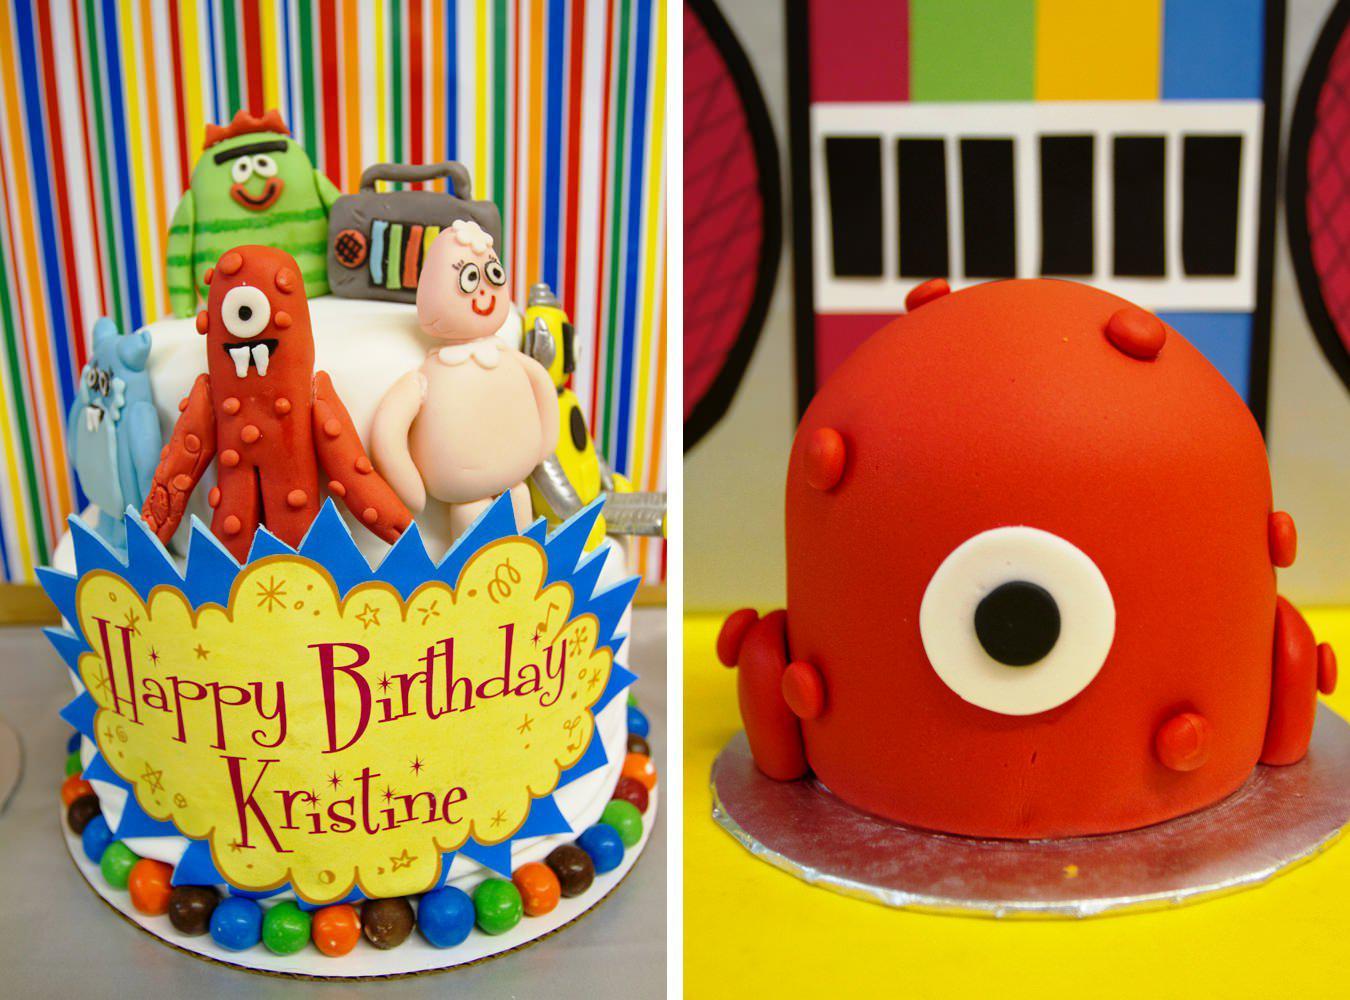 10 Gorgeous Yo Gabba Gabba Cakes Ideas yo gabba gabba themed birthday cakes urban dog coffee yo gabba 2020